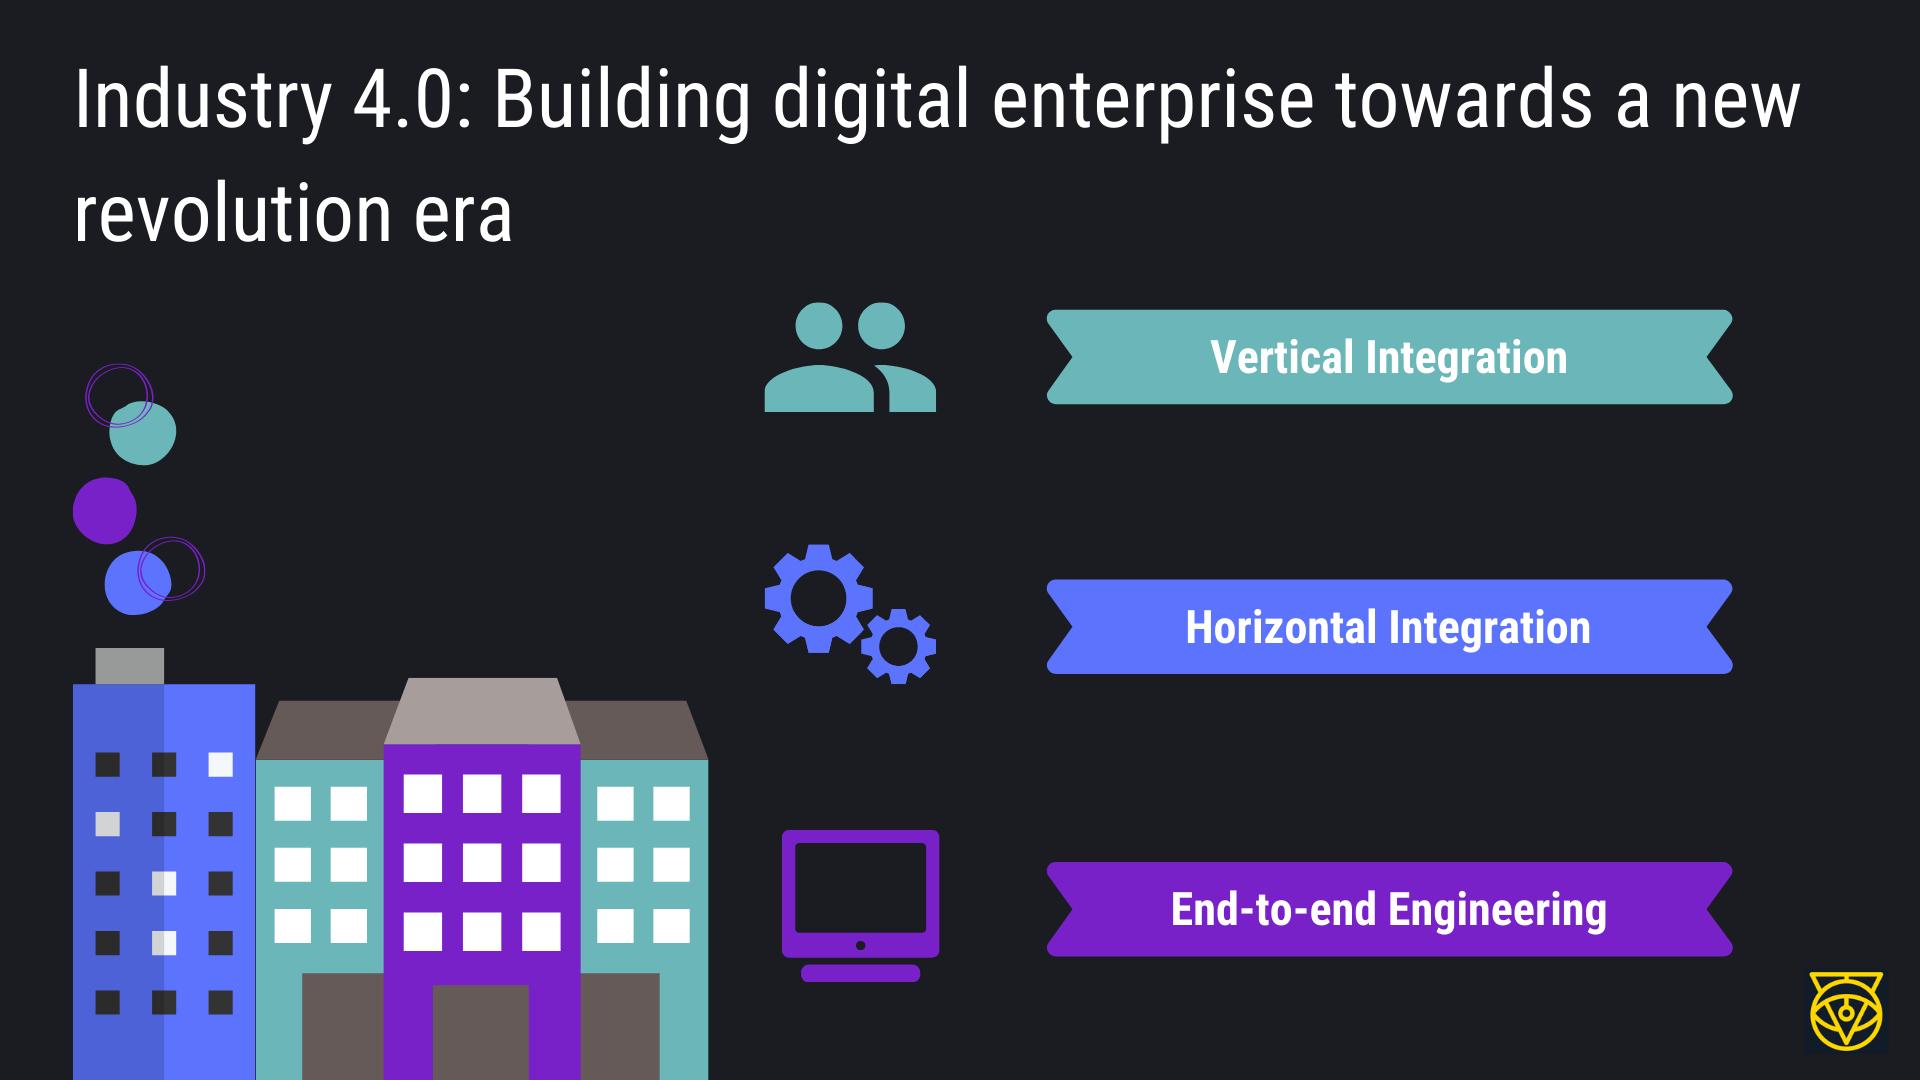 Industry 4.0: Building digital enterprise towards a new revolution era